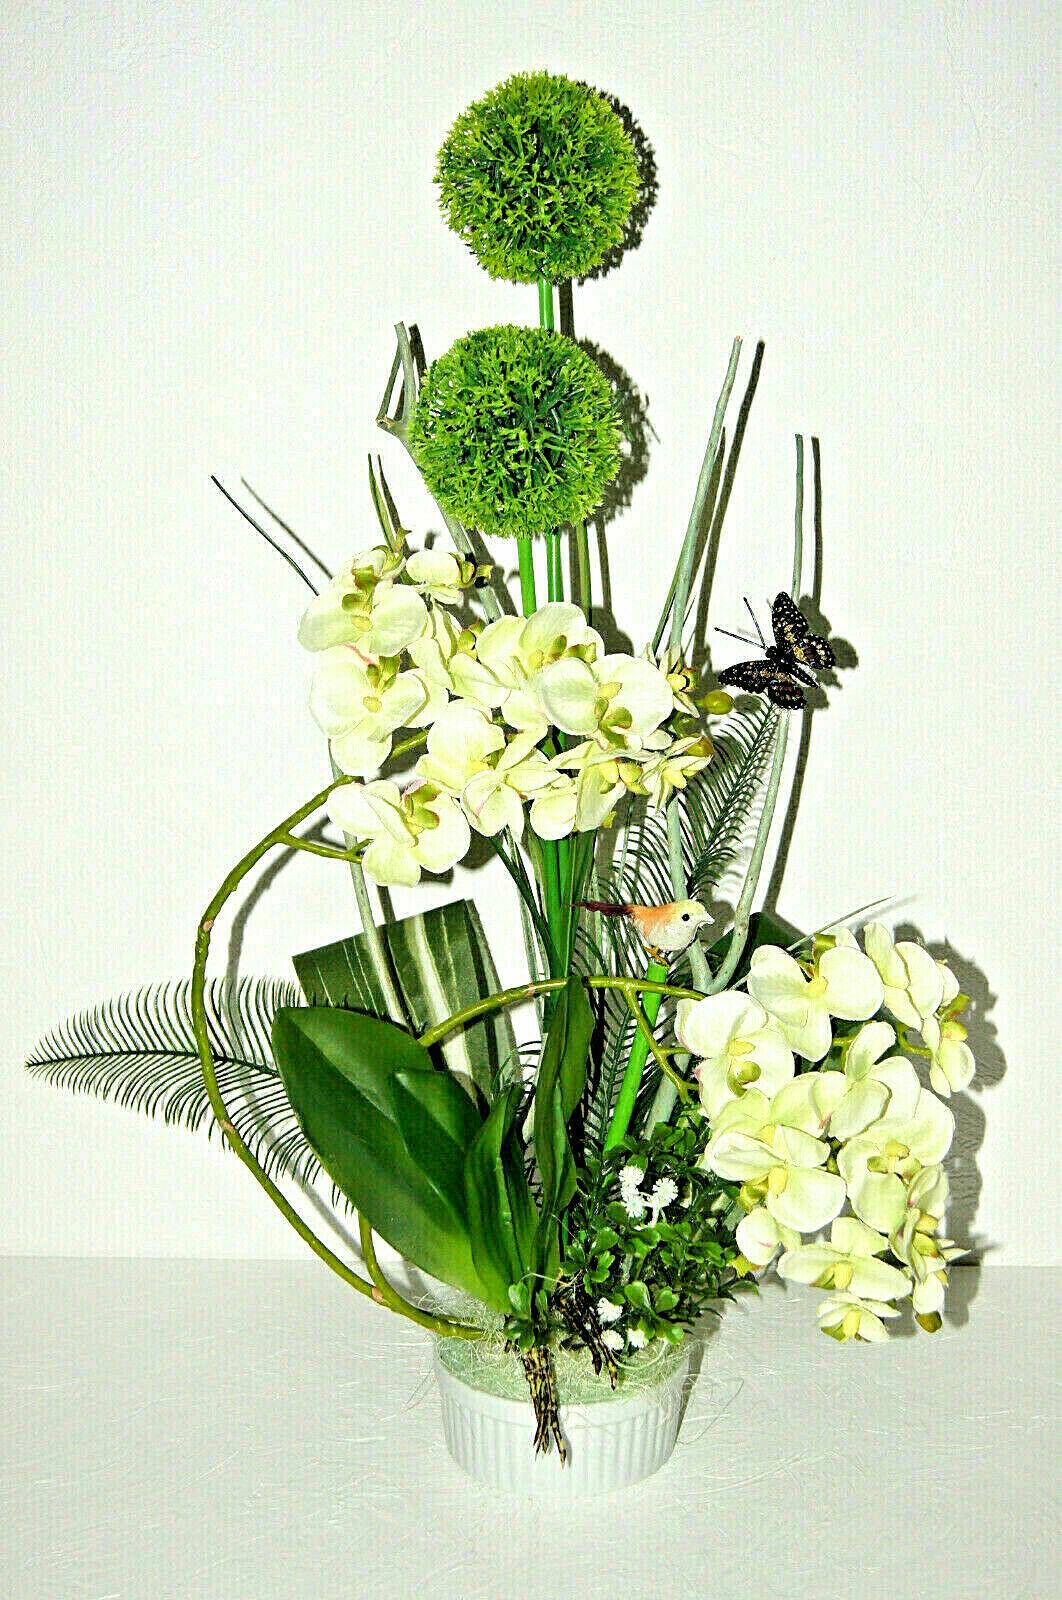 Orchidee Kunstpflanze Phalaenopsis Arrangements Grün Kunstblumen Dekoration